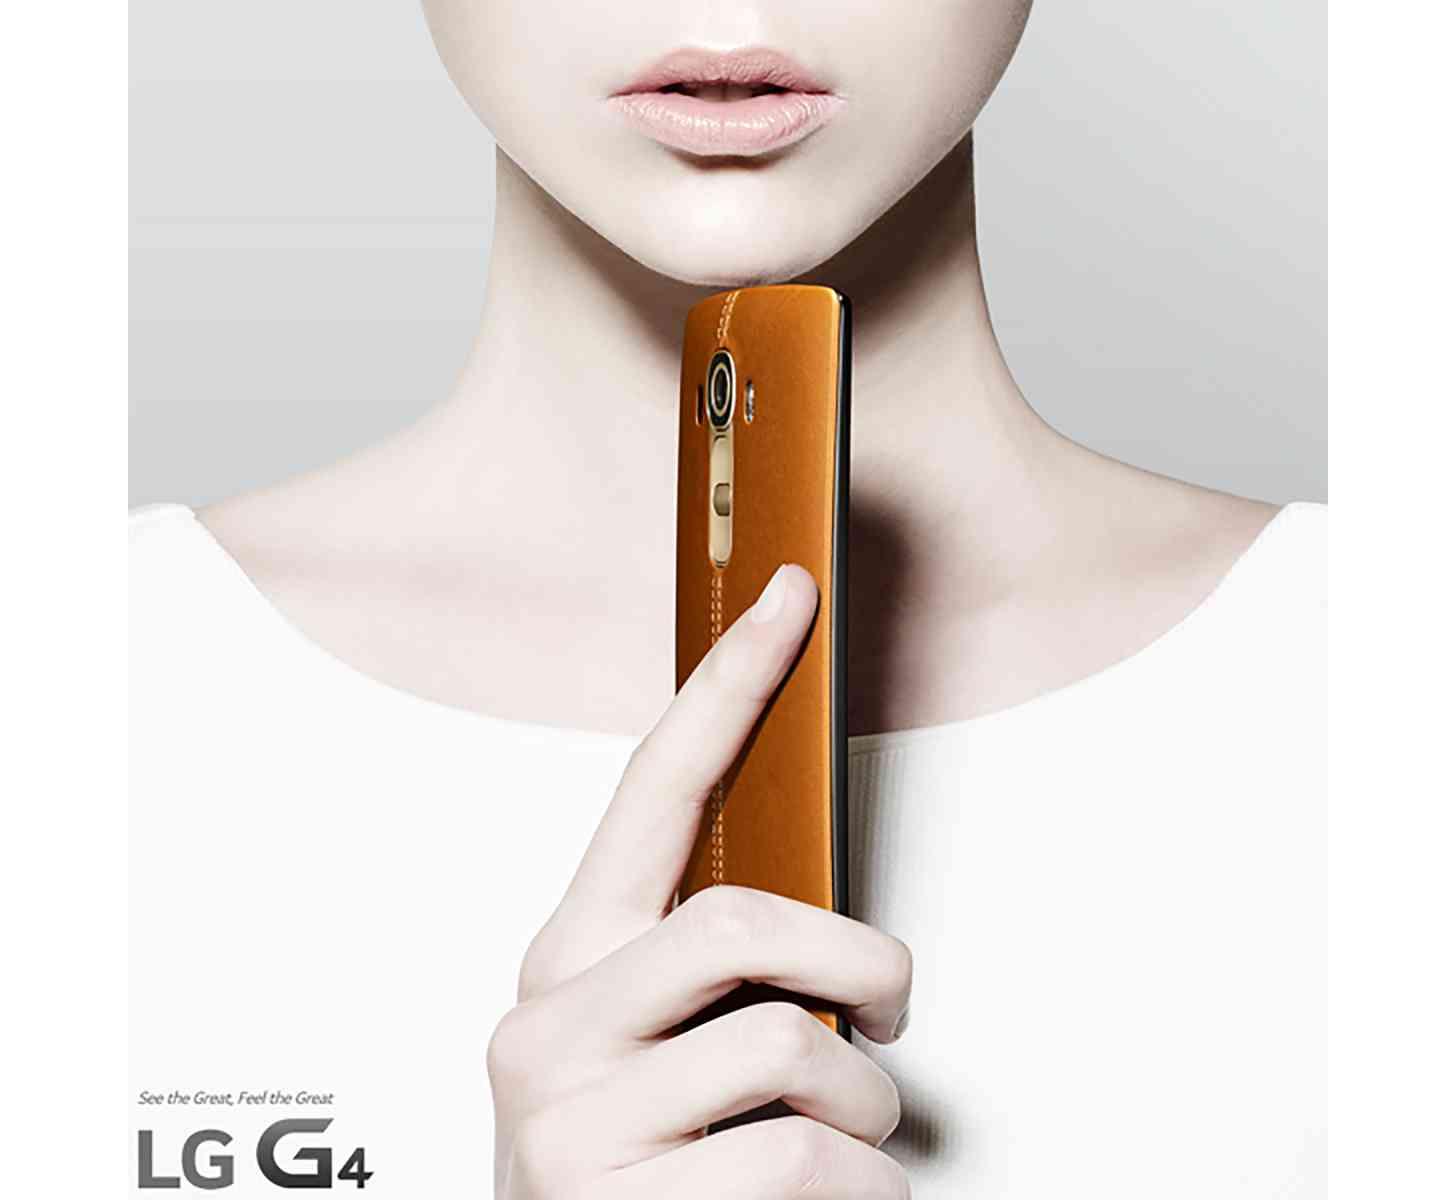 LG G4 leather back confirmed